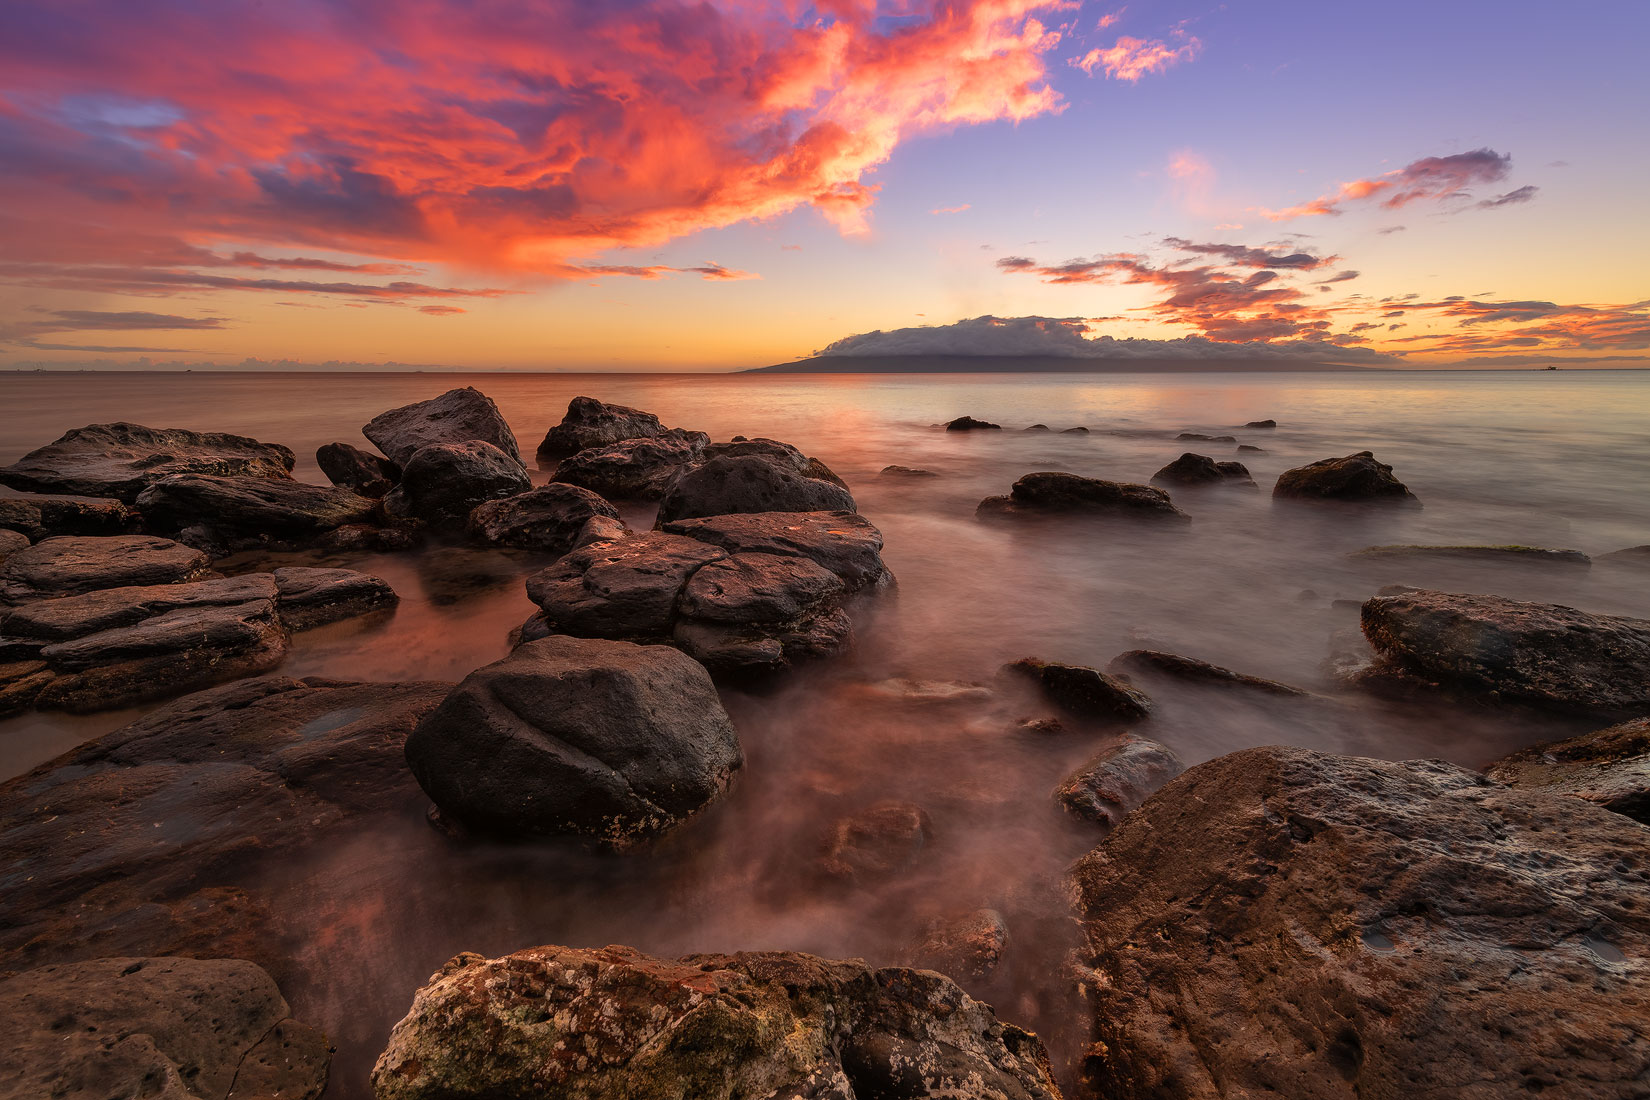 Maui_sunset-0119.jpg